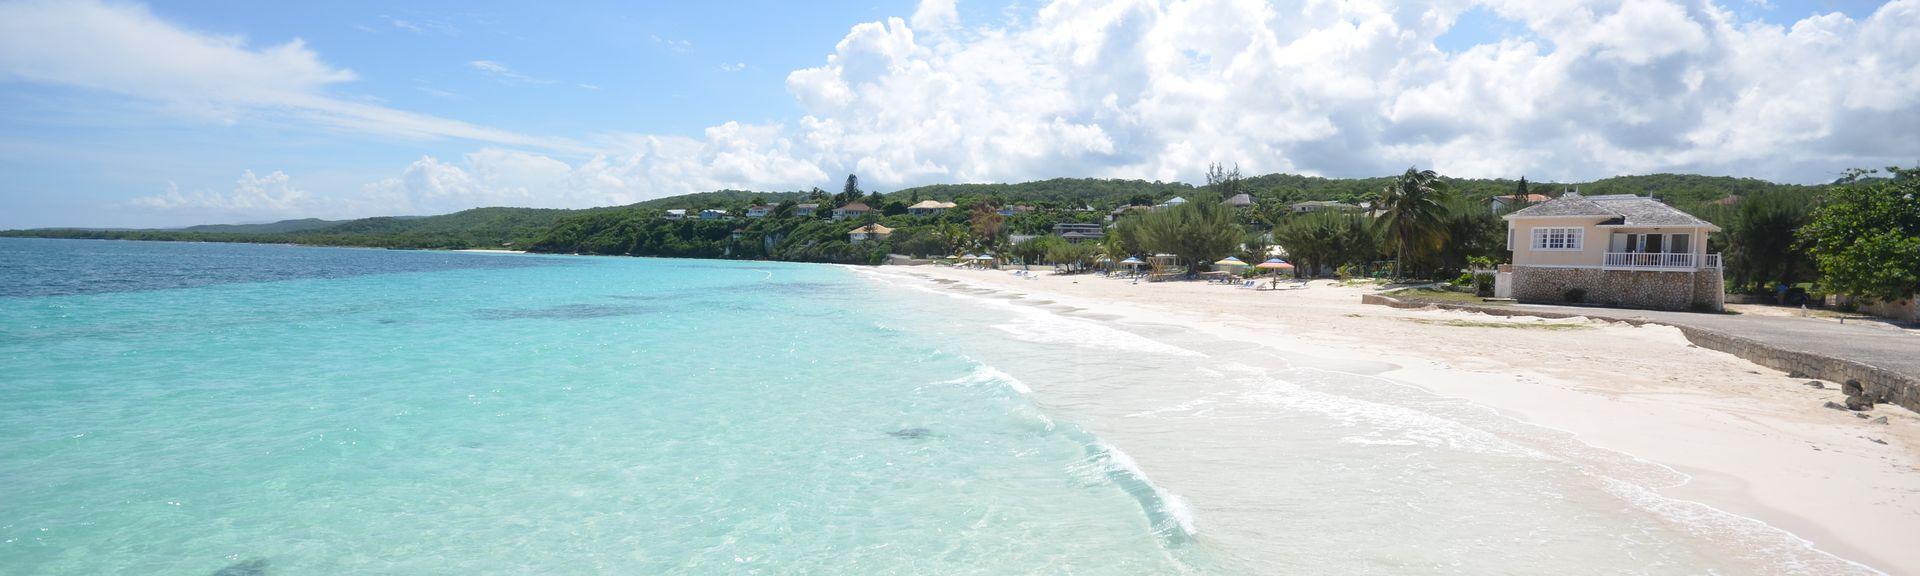 Trelawny Parish, Jamaica